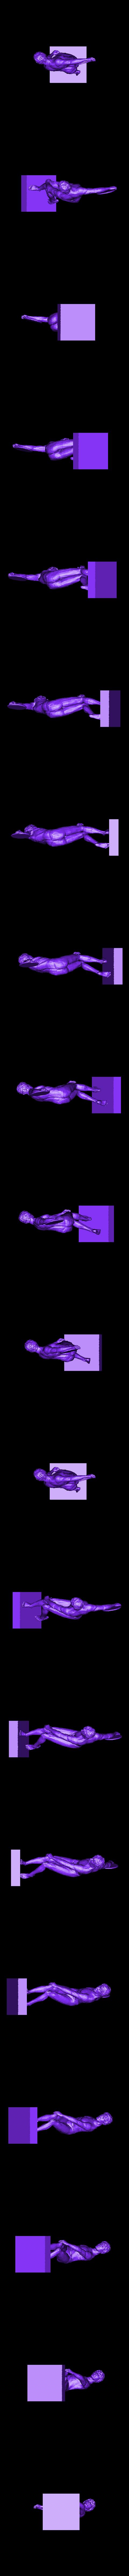 MANWITHADISC.stl Download free STL file Discus throw man • 3D printable model, Boris3dStudio